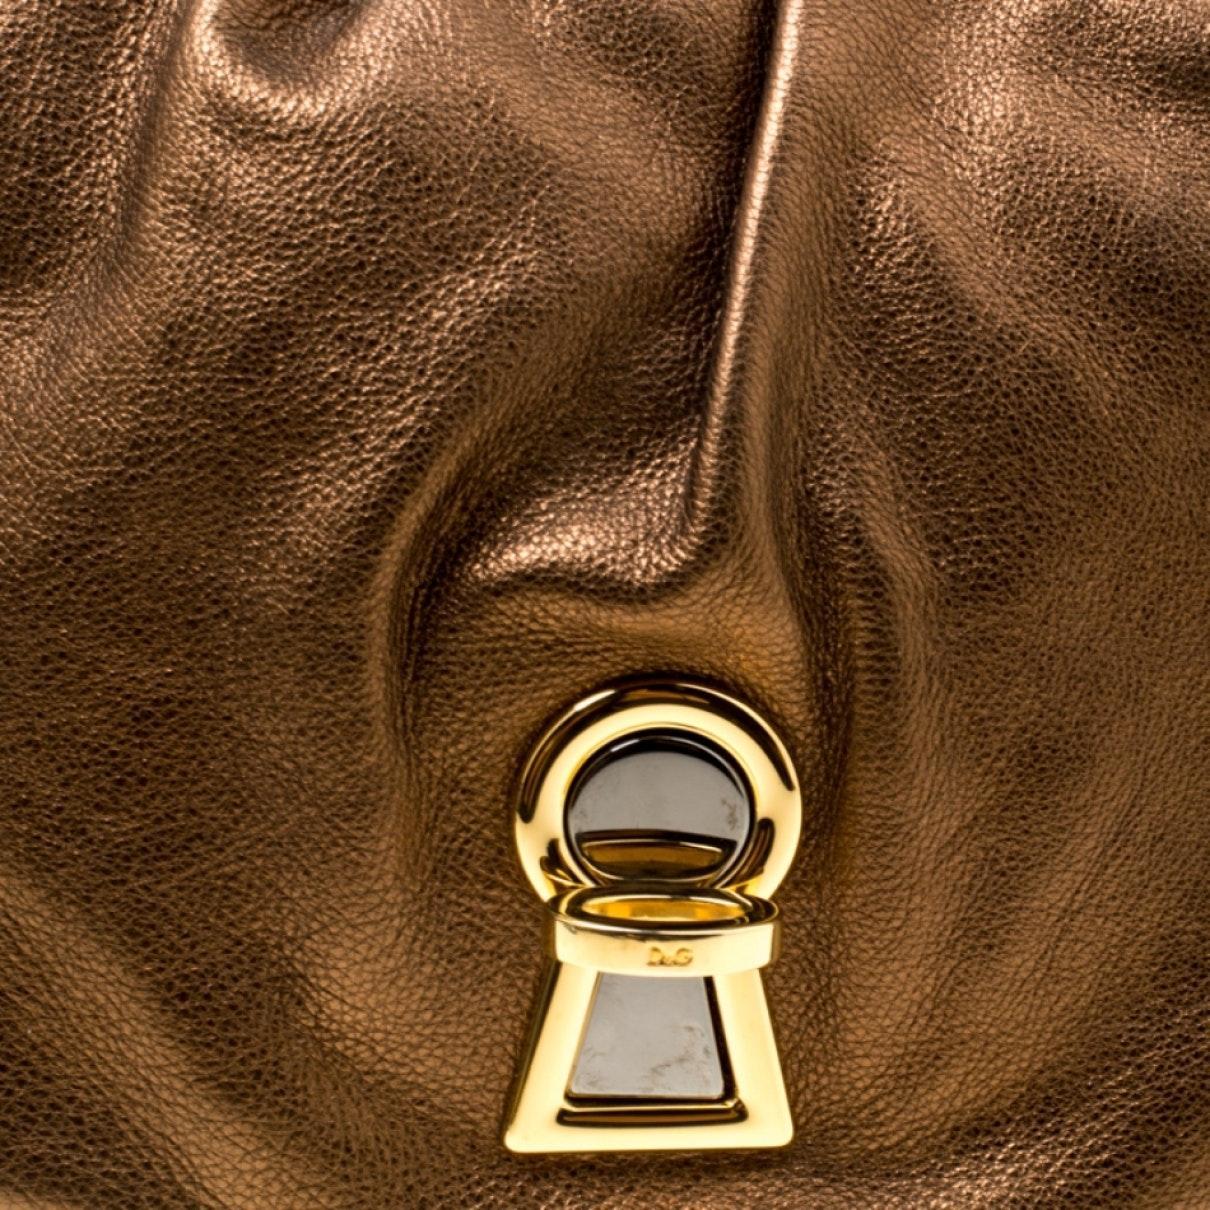 Sac à main en Cuir Métallisé Cuir Dolce & Gabbana en coloris Marron 9bYq